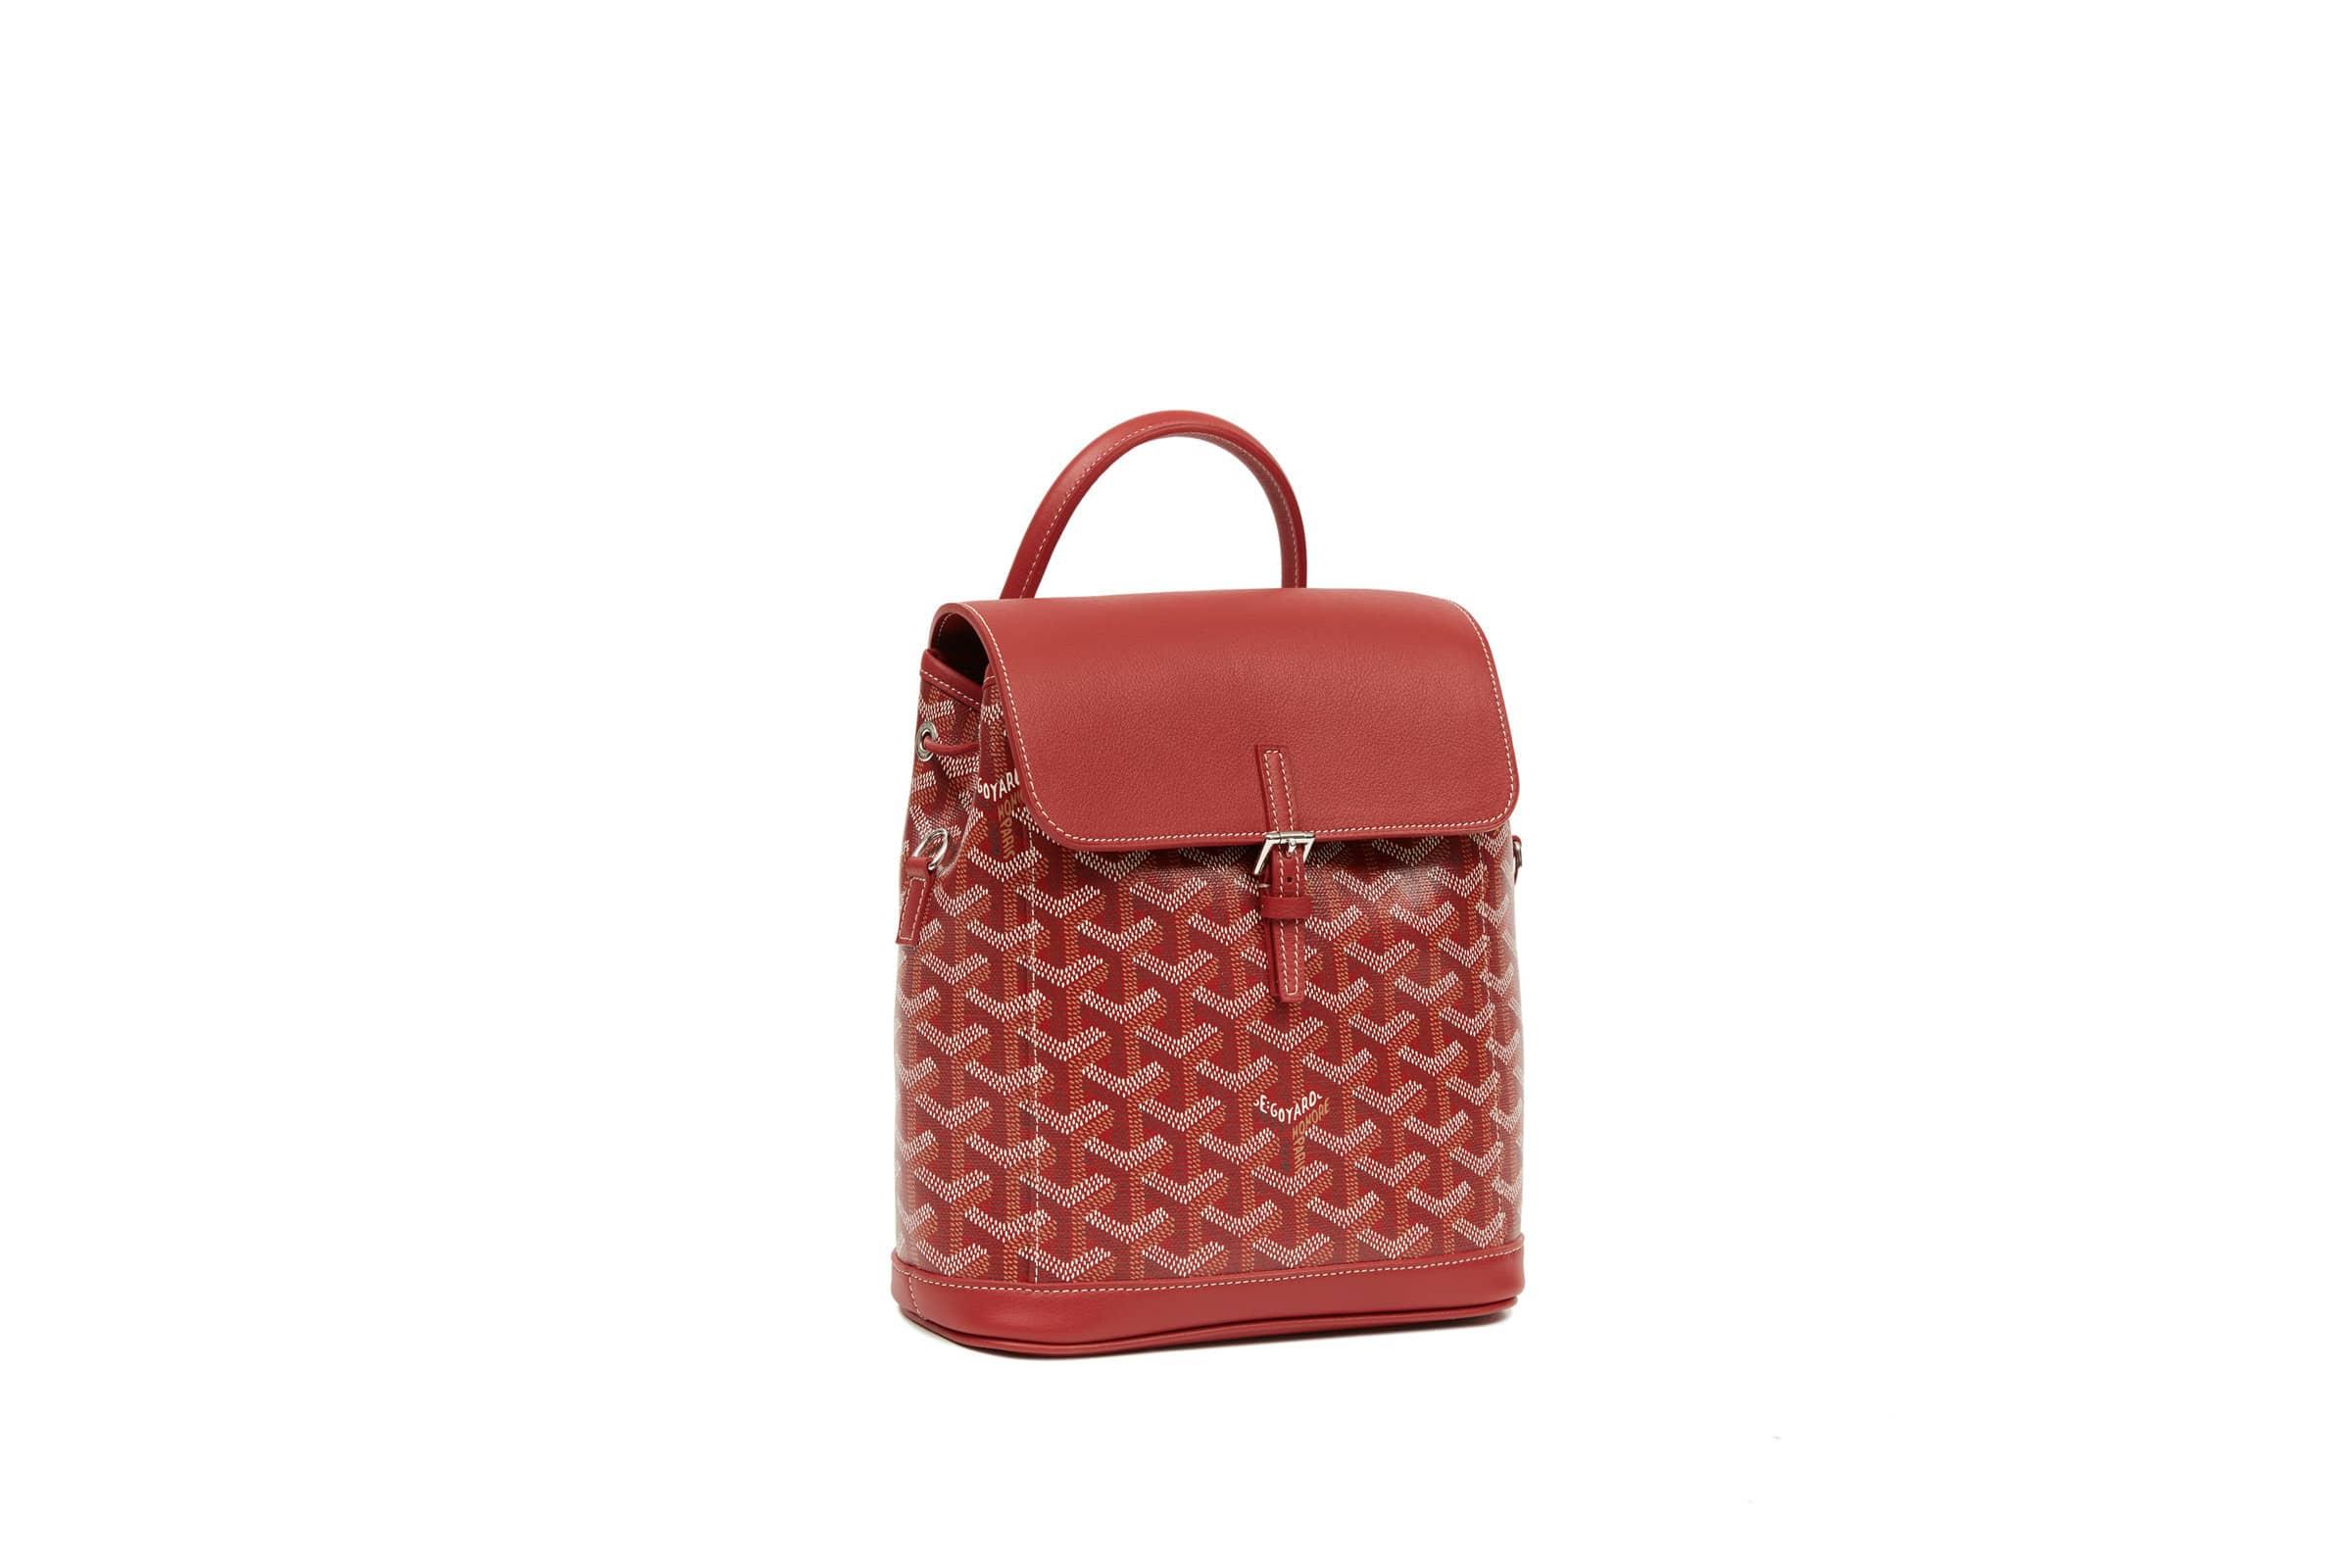 goyard alpin mini handbags backpack new 2019 3 ways